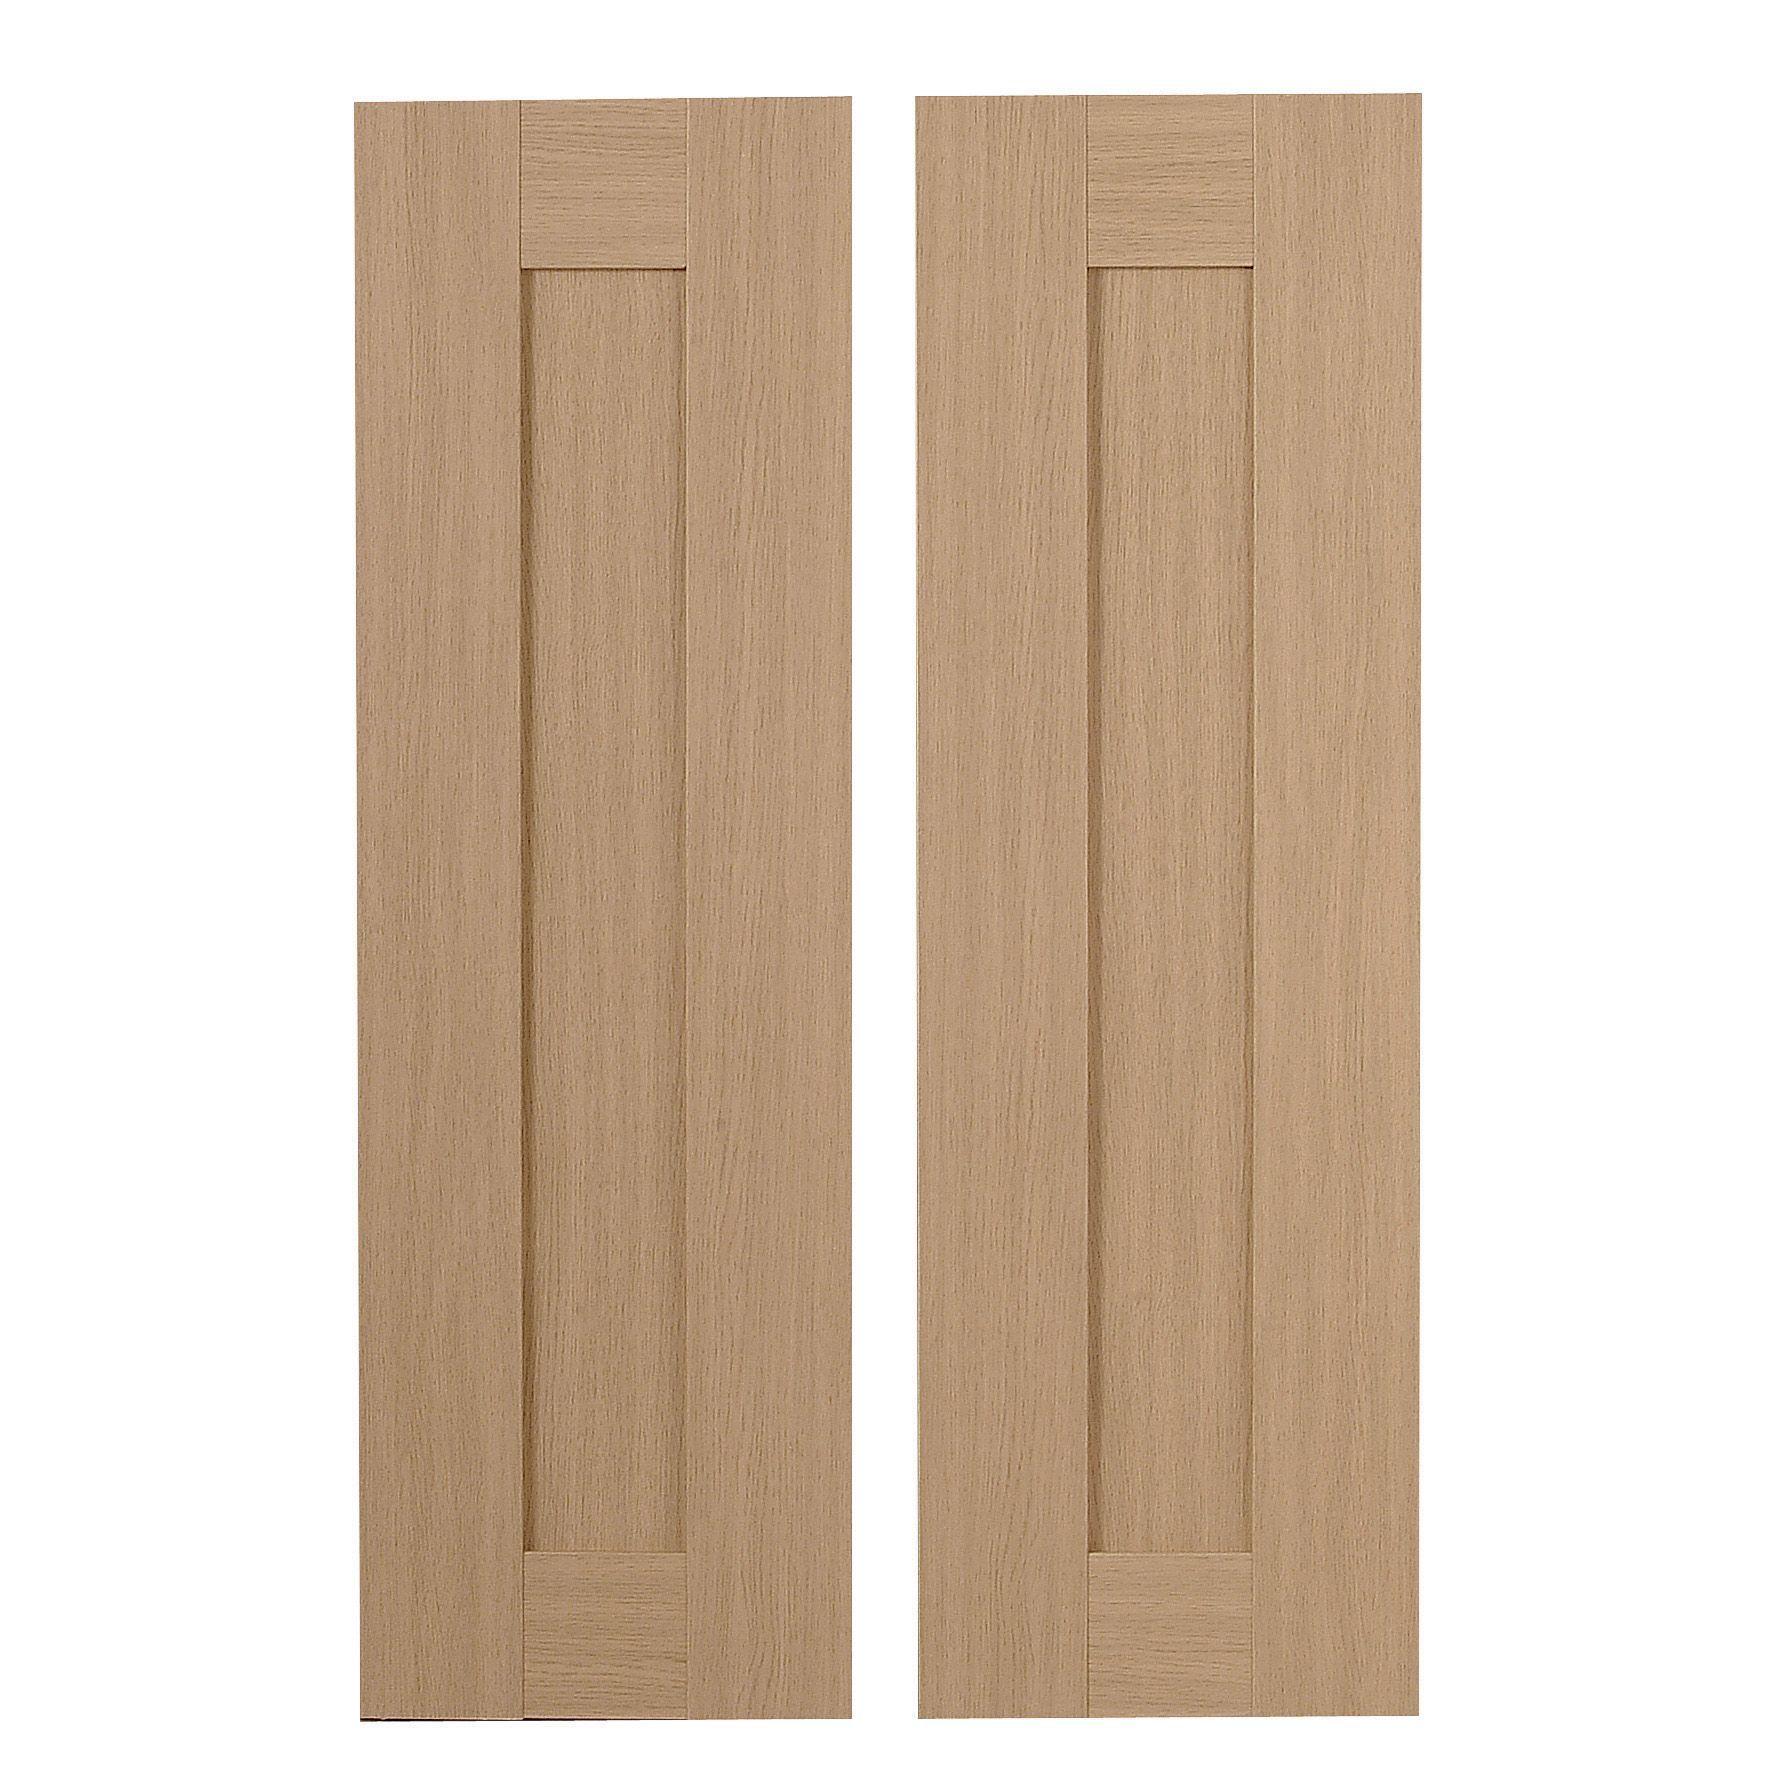 It Kitchens Westleigh Textured Oak Effect Shaker Larder Door (w)300mm, Set Of 2